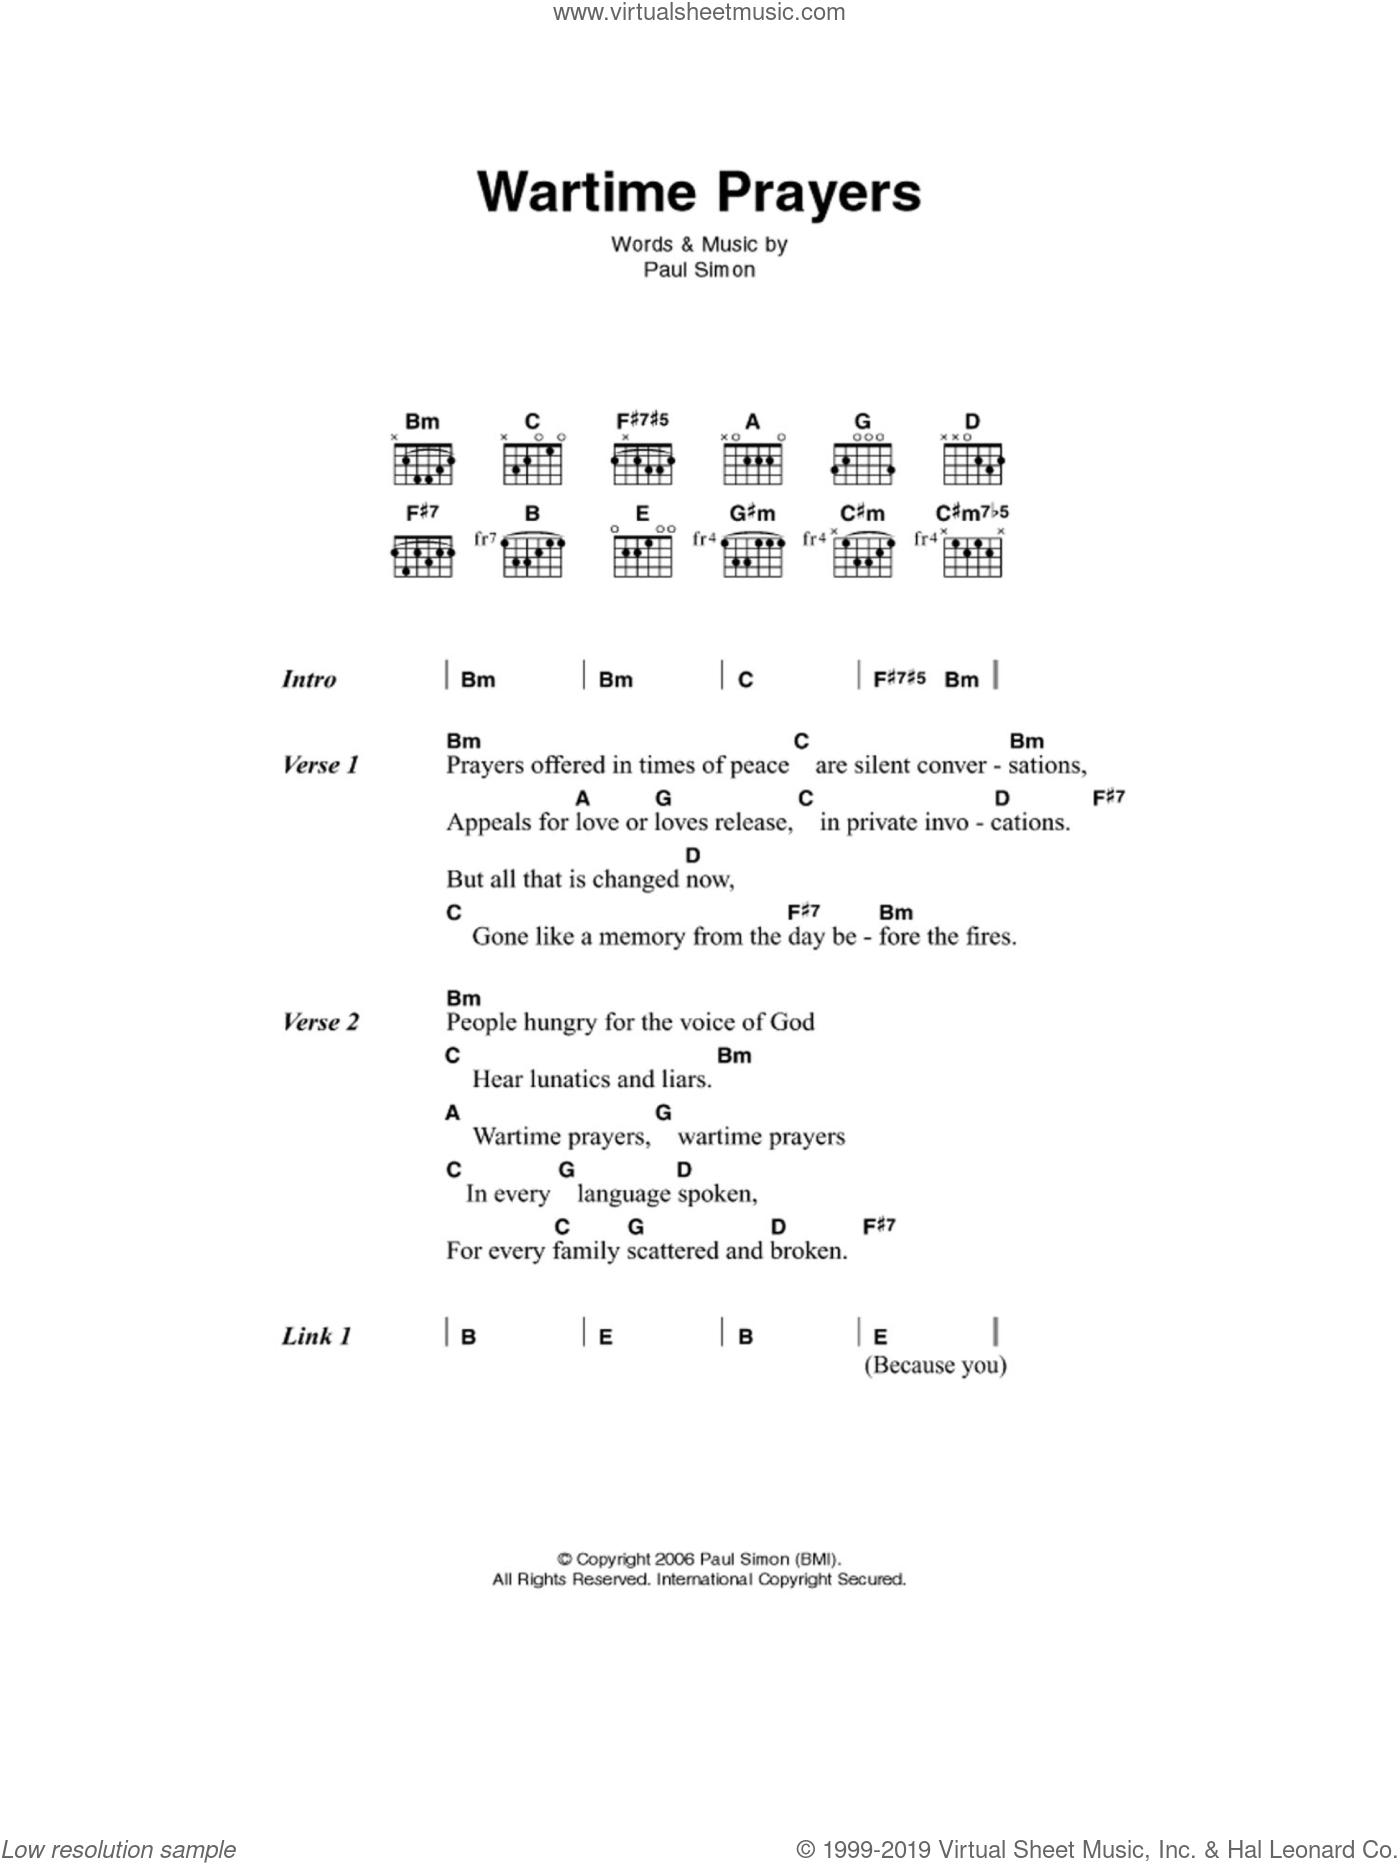 Simon - Wartime Prayers sheet music for guitar (chords) [PDF]